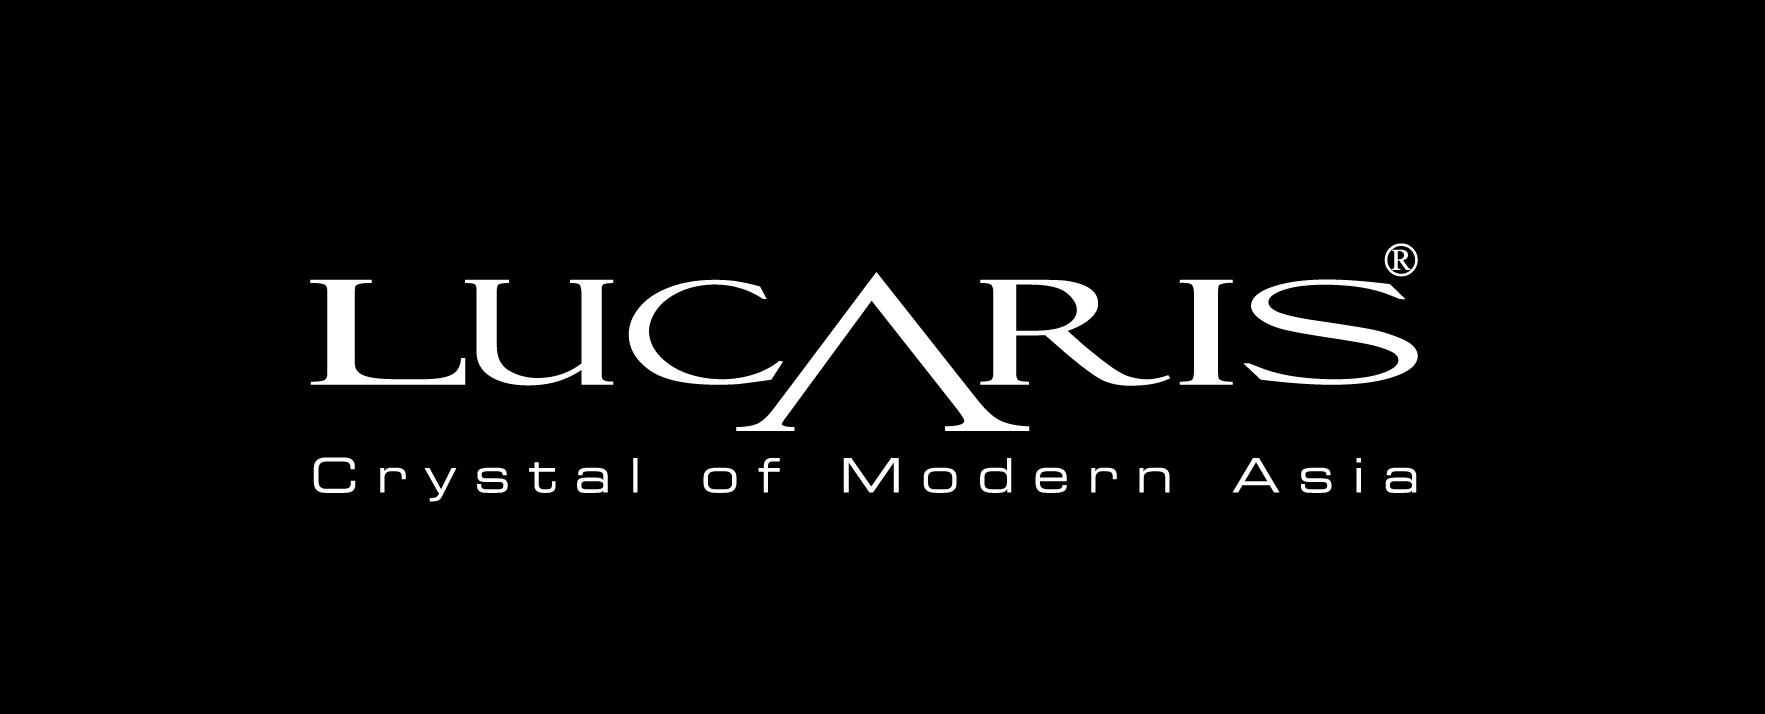 Lucaris